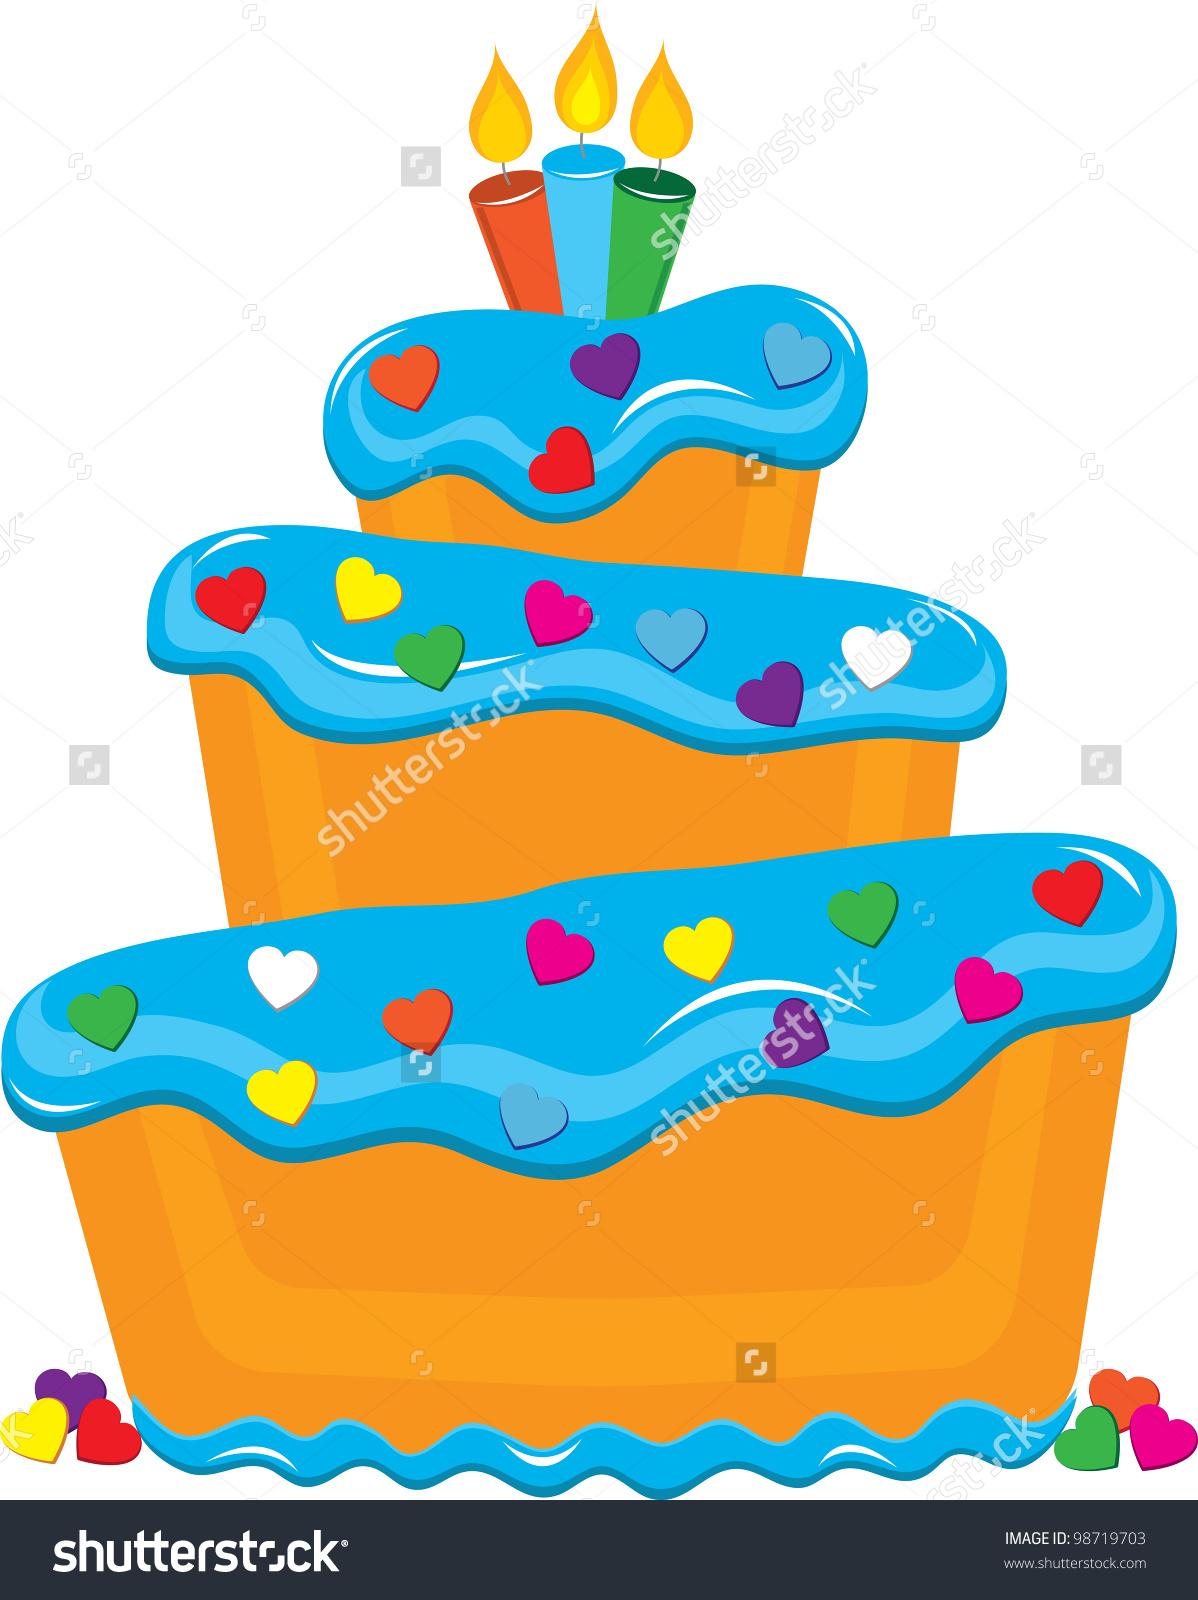 Clip Art Illustration Fancy Layer Cake Stock Illustration 98719703.